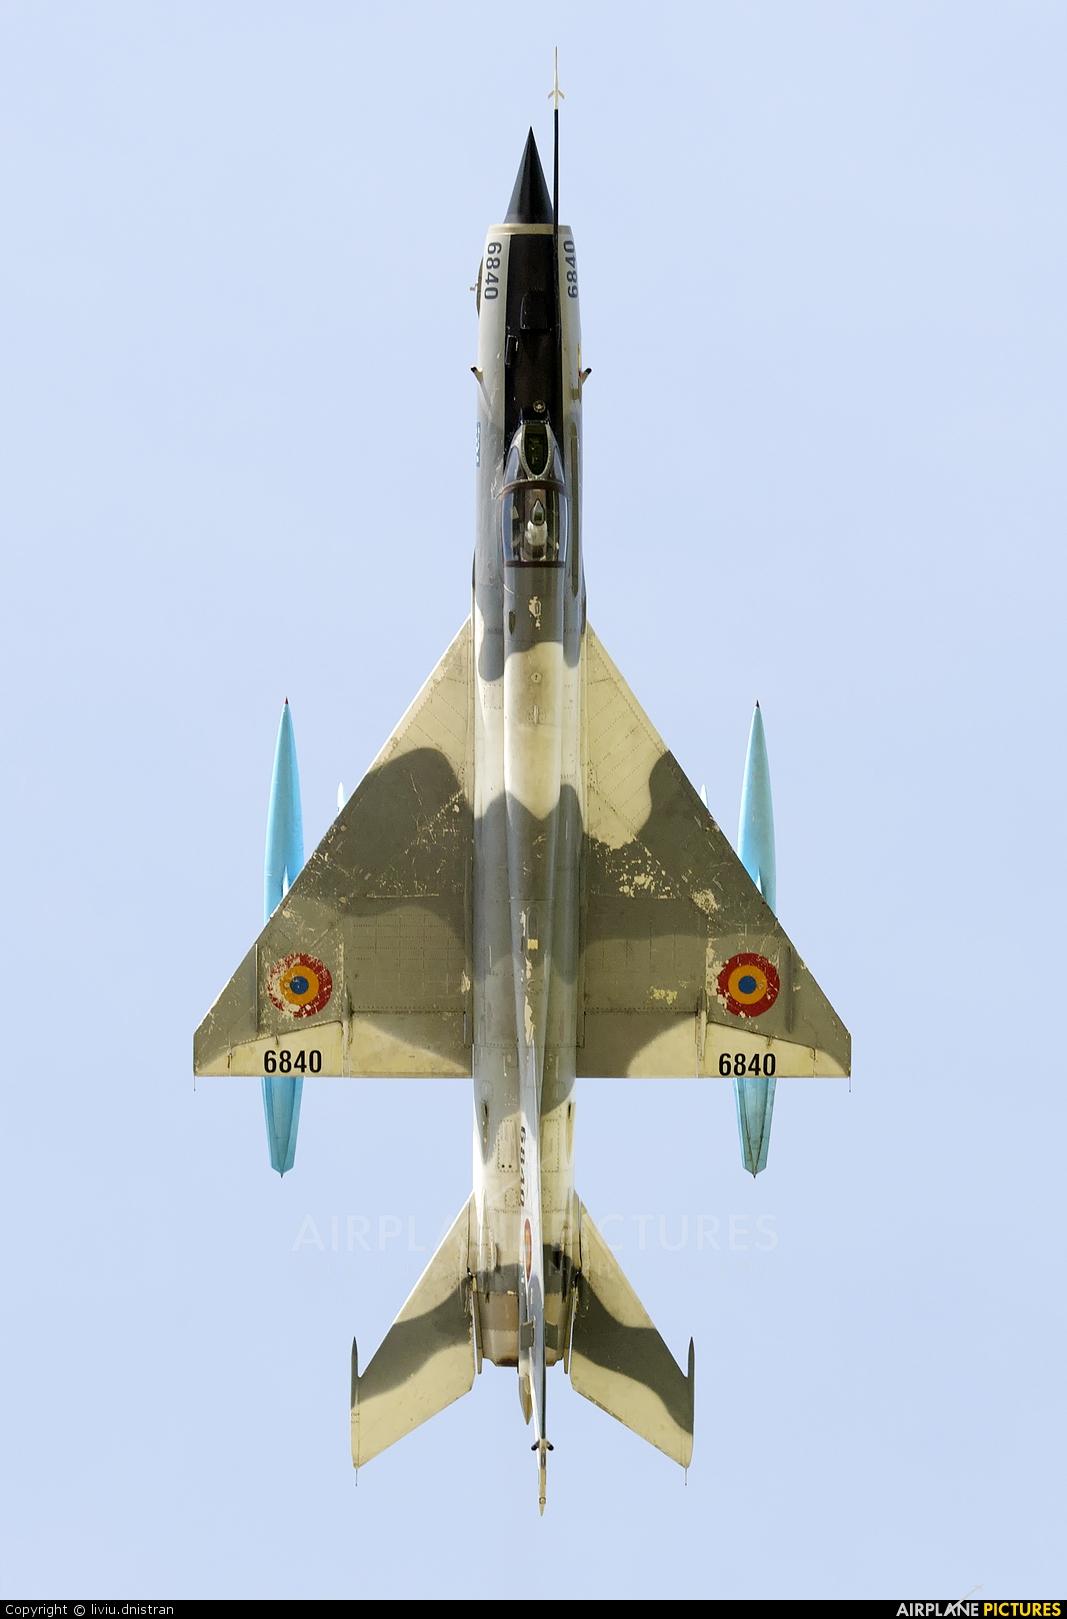 Romania - Air Force 6840 aircraft at Cluj Napoca - Someseni